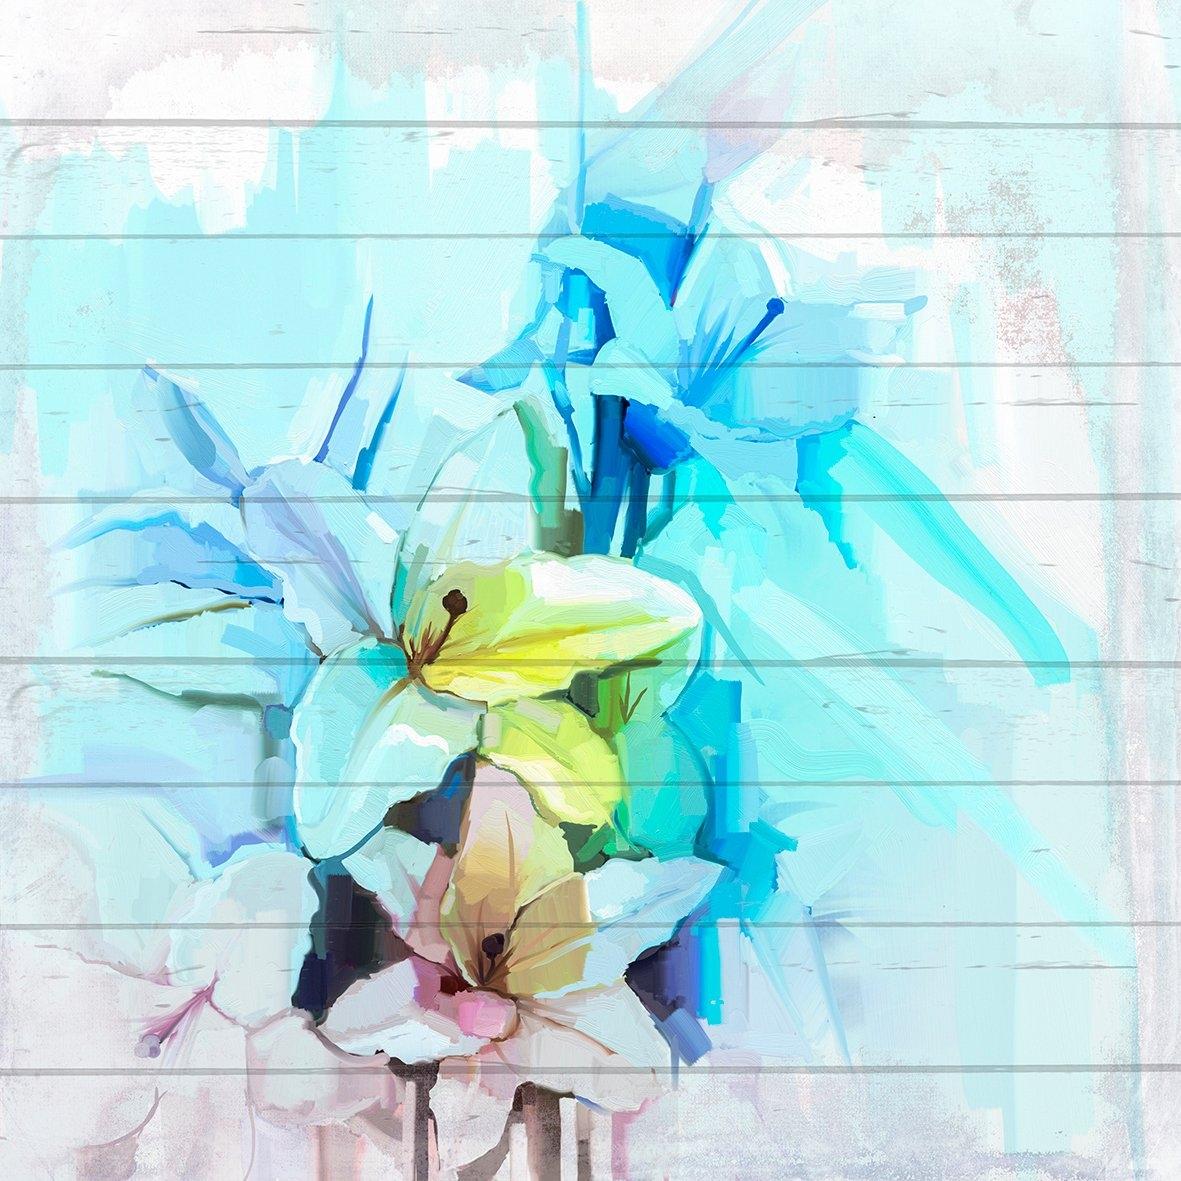 Queence artprint op hout »Blau-Weiße Blüten«, 40x40 cm Echtholz bestellen: 30 dagen bedenktijd